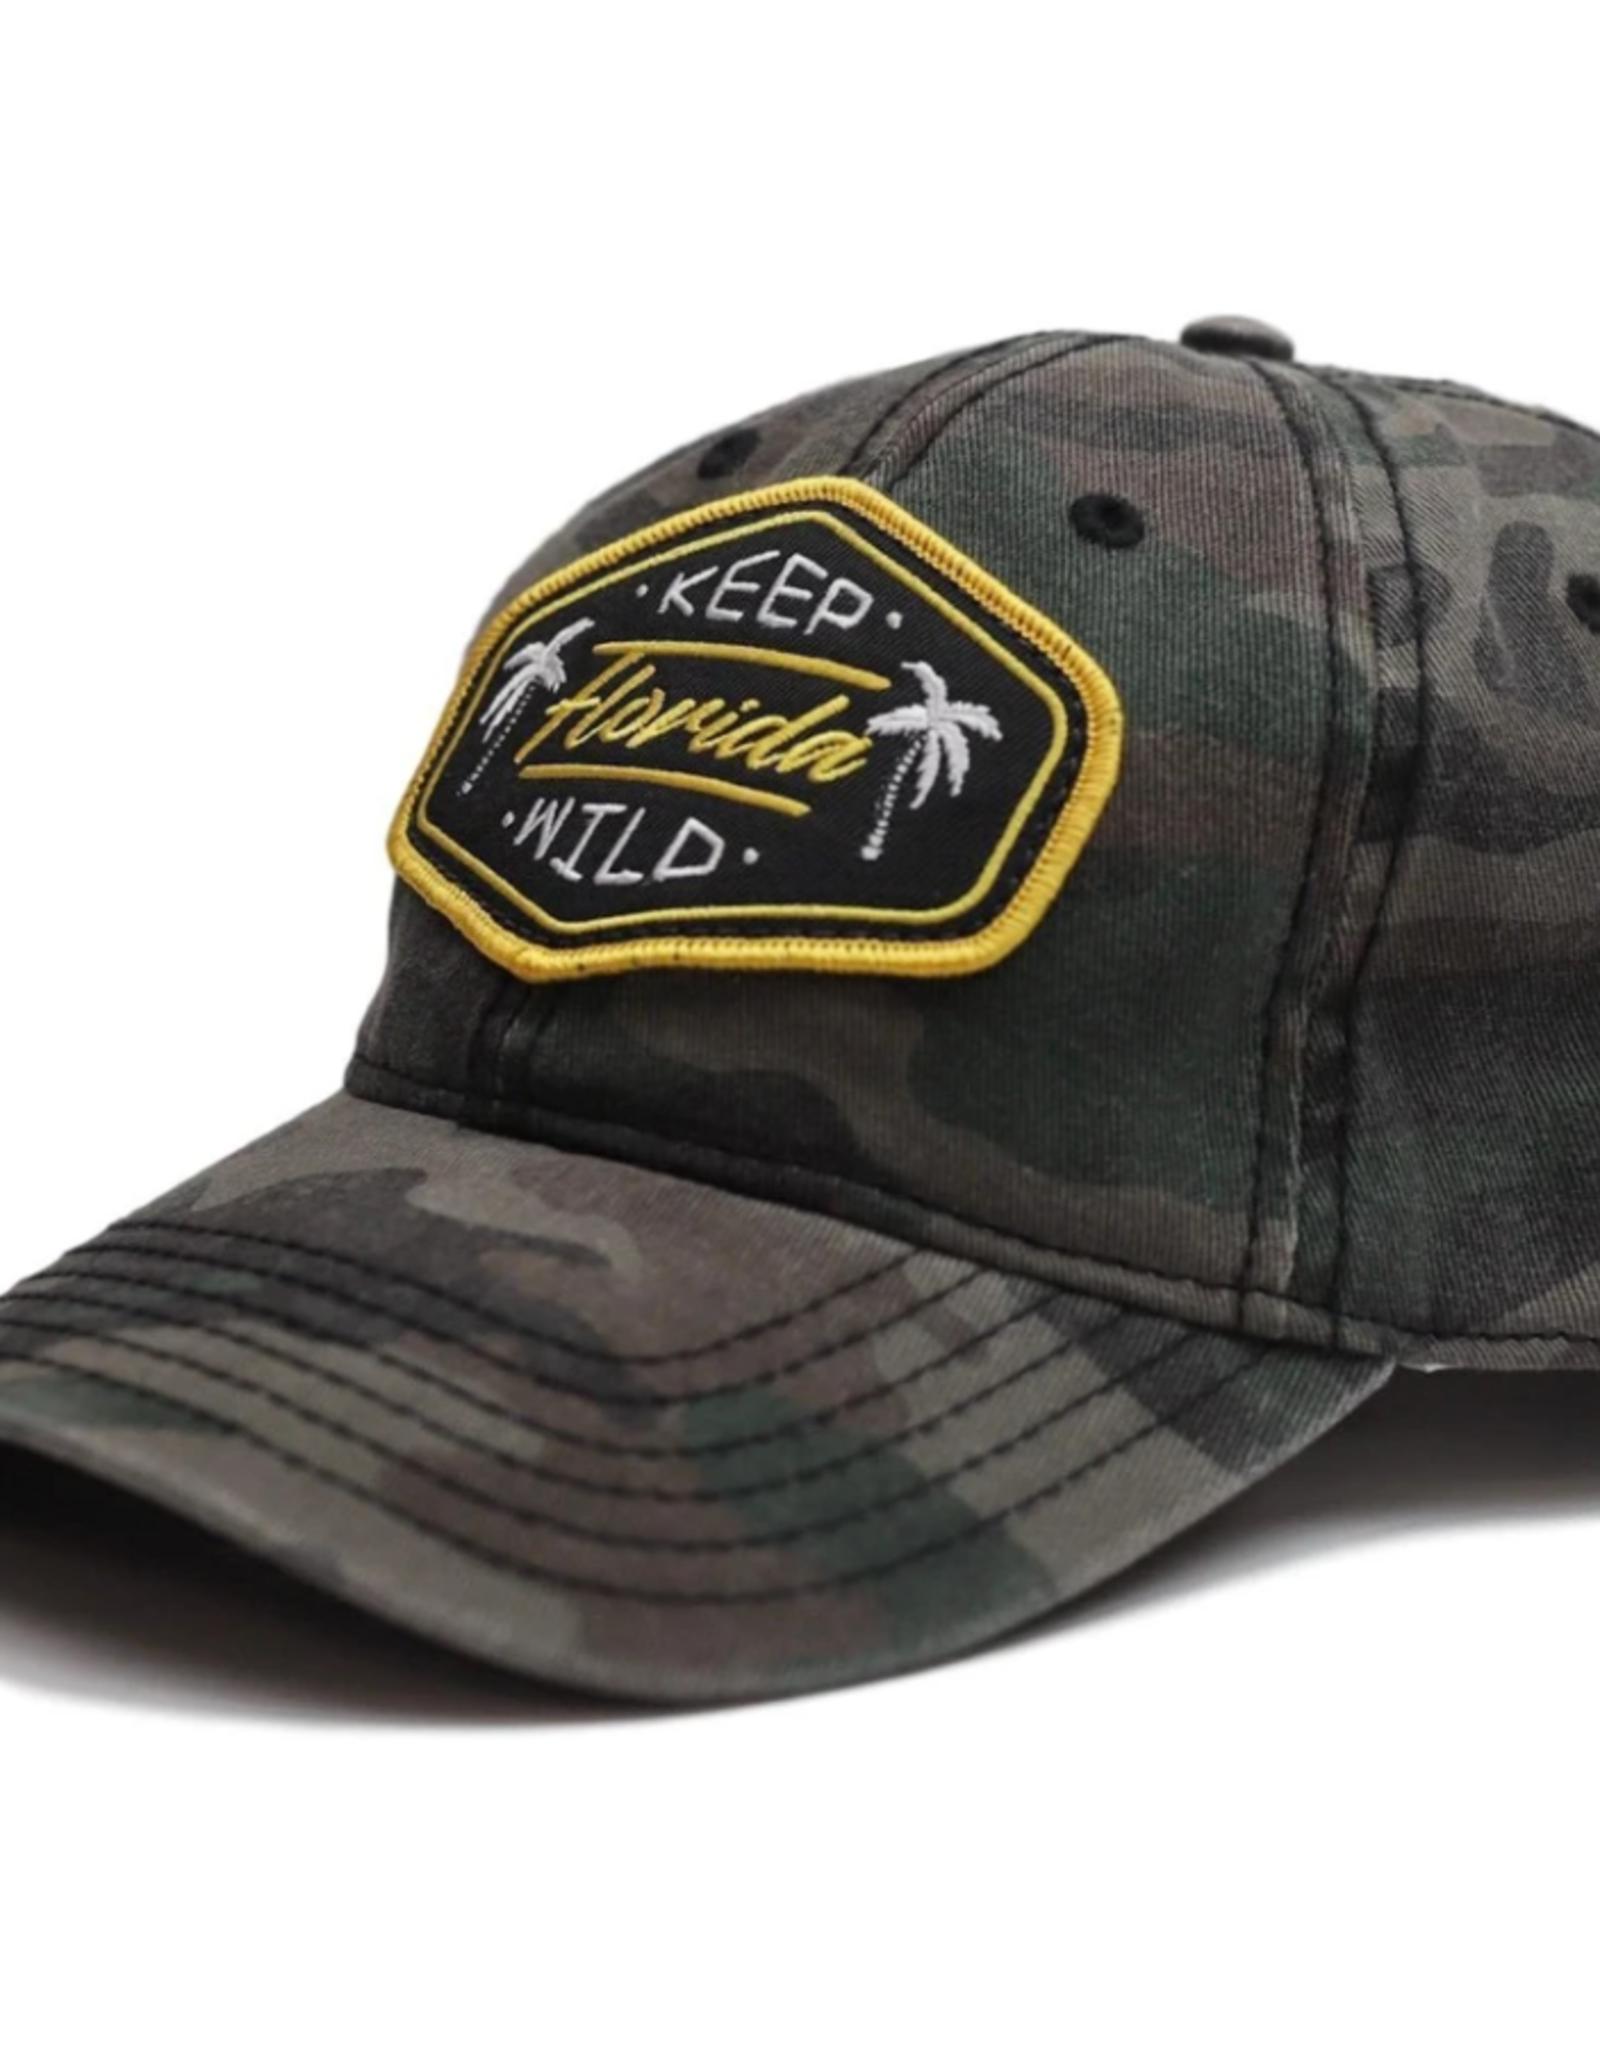 Sunshine State Goods Hat - Keep Florida Wild - Unstructured Camo